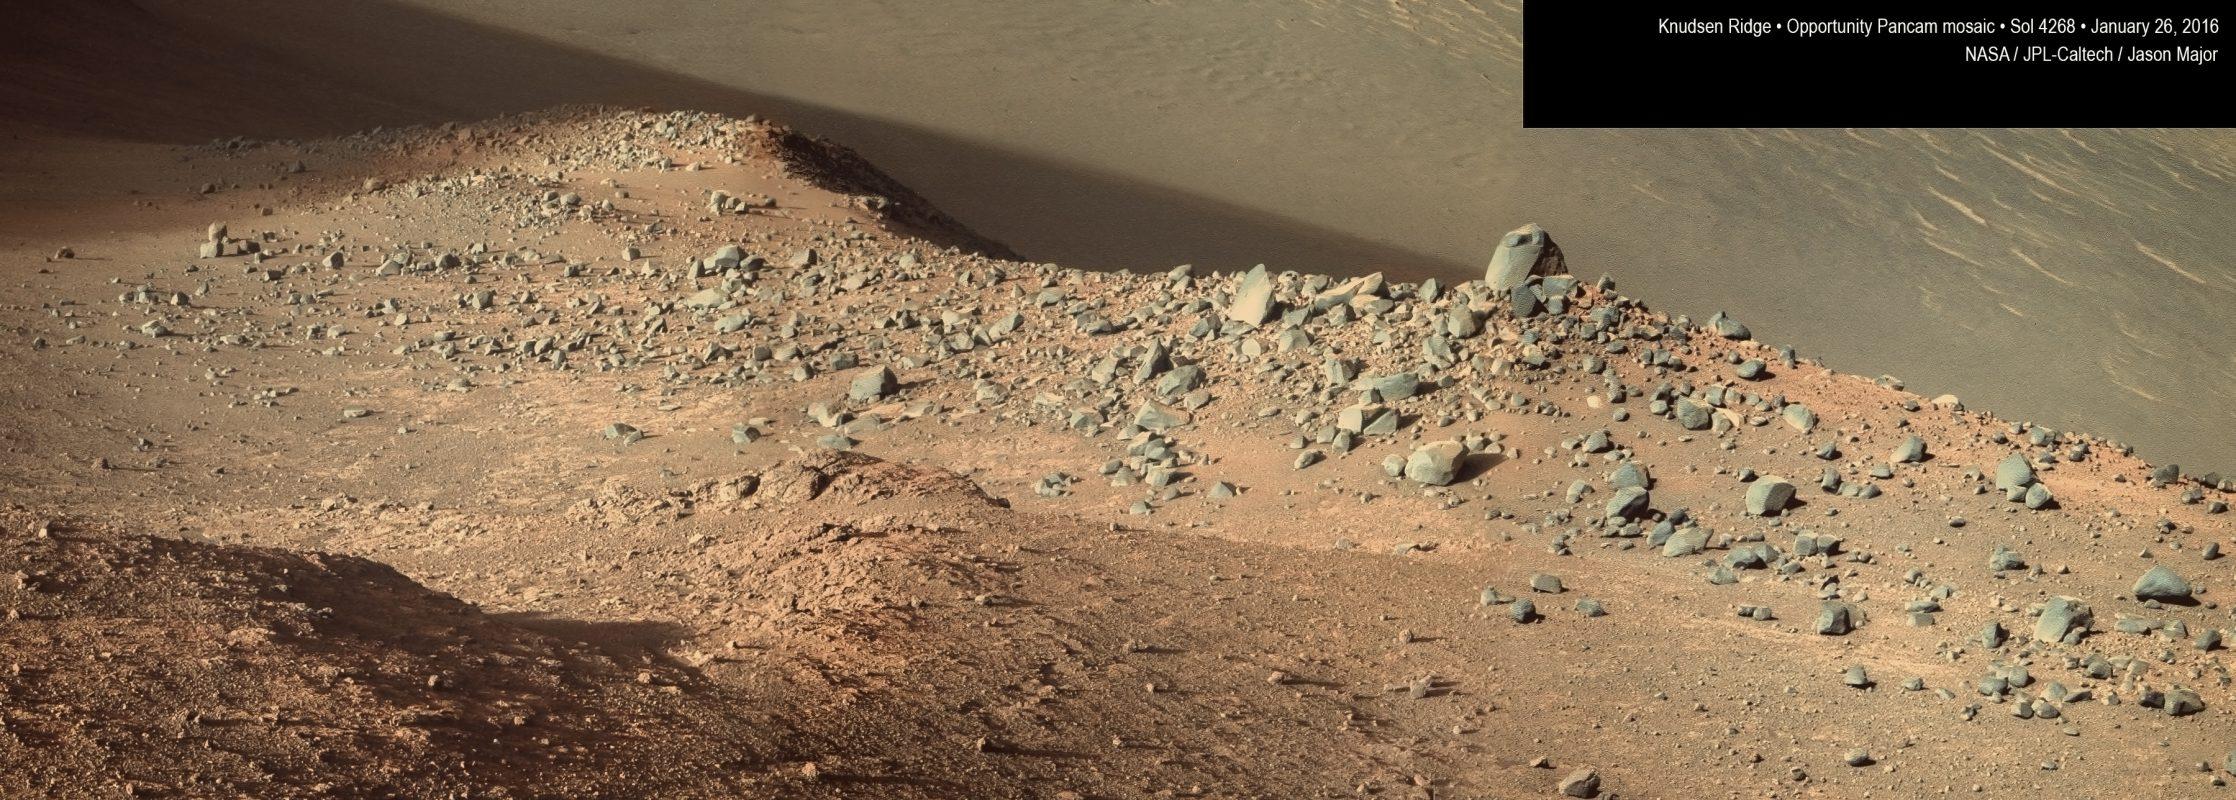 Mars panorama from Curiosity